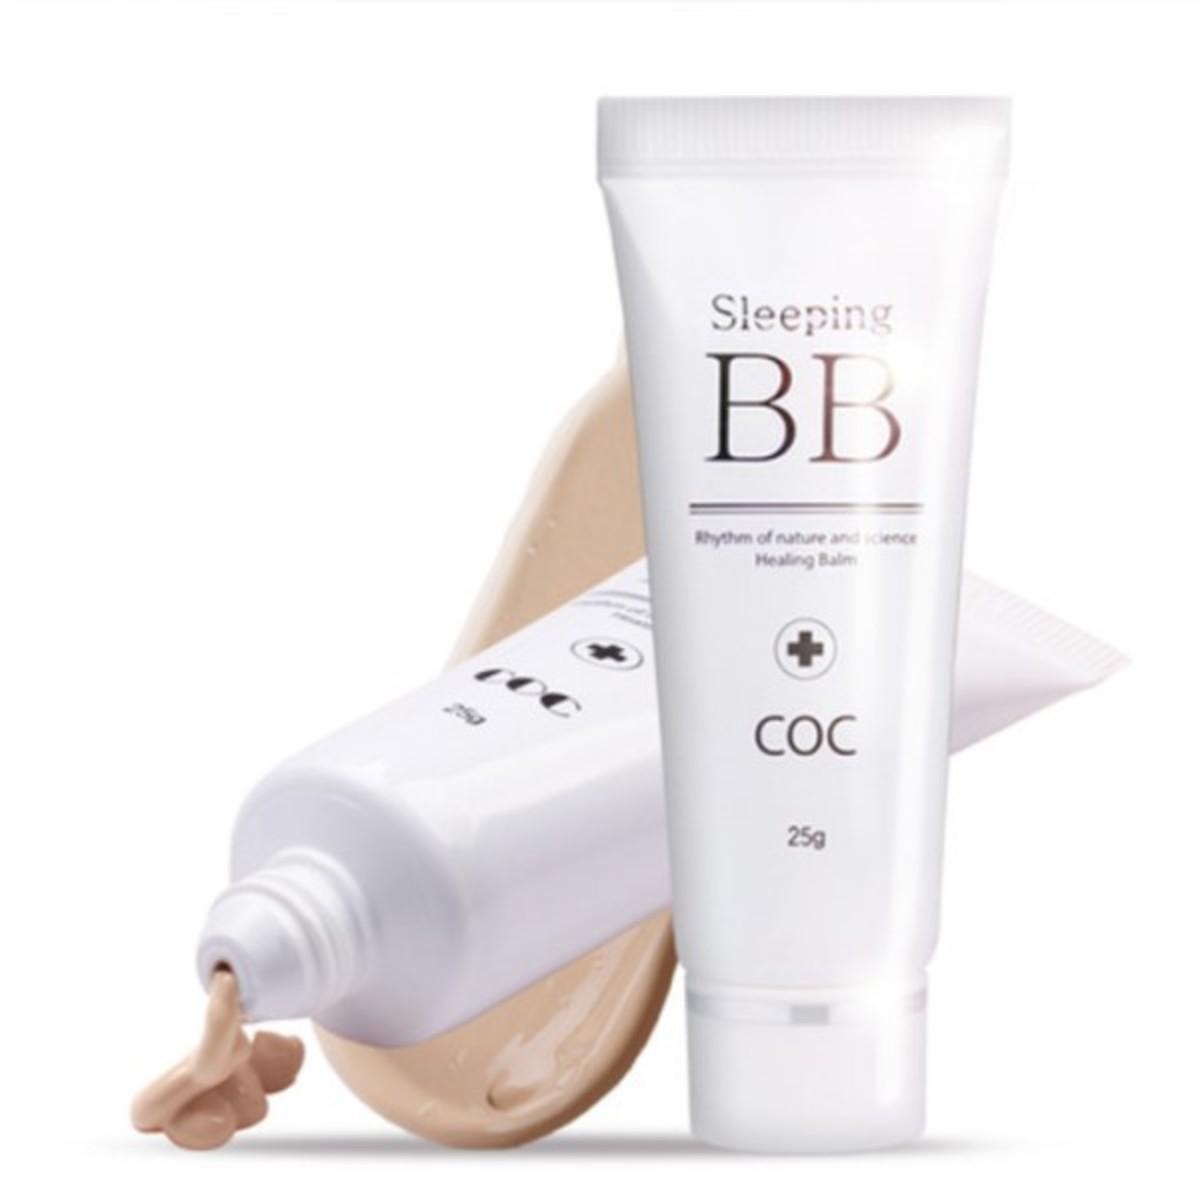 Sleeping bb cream